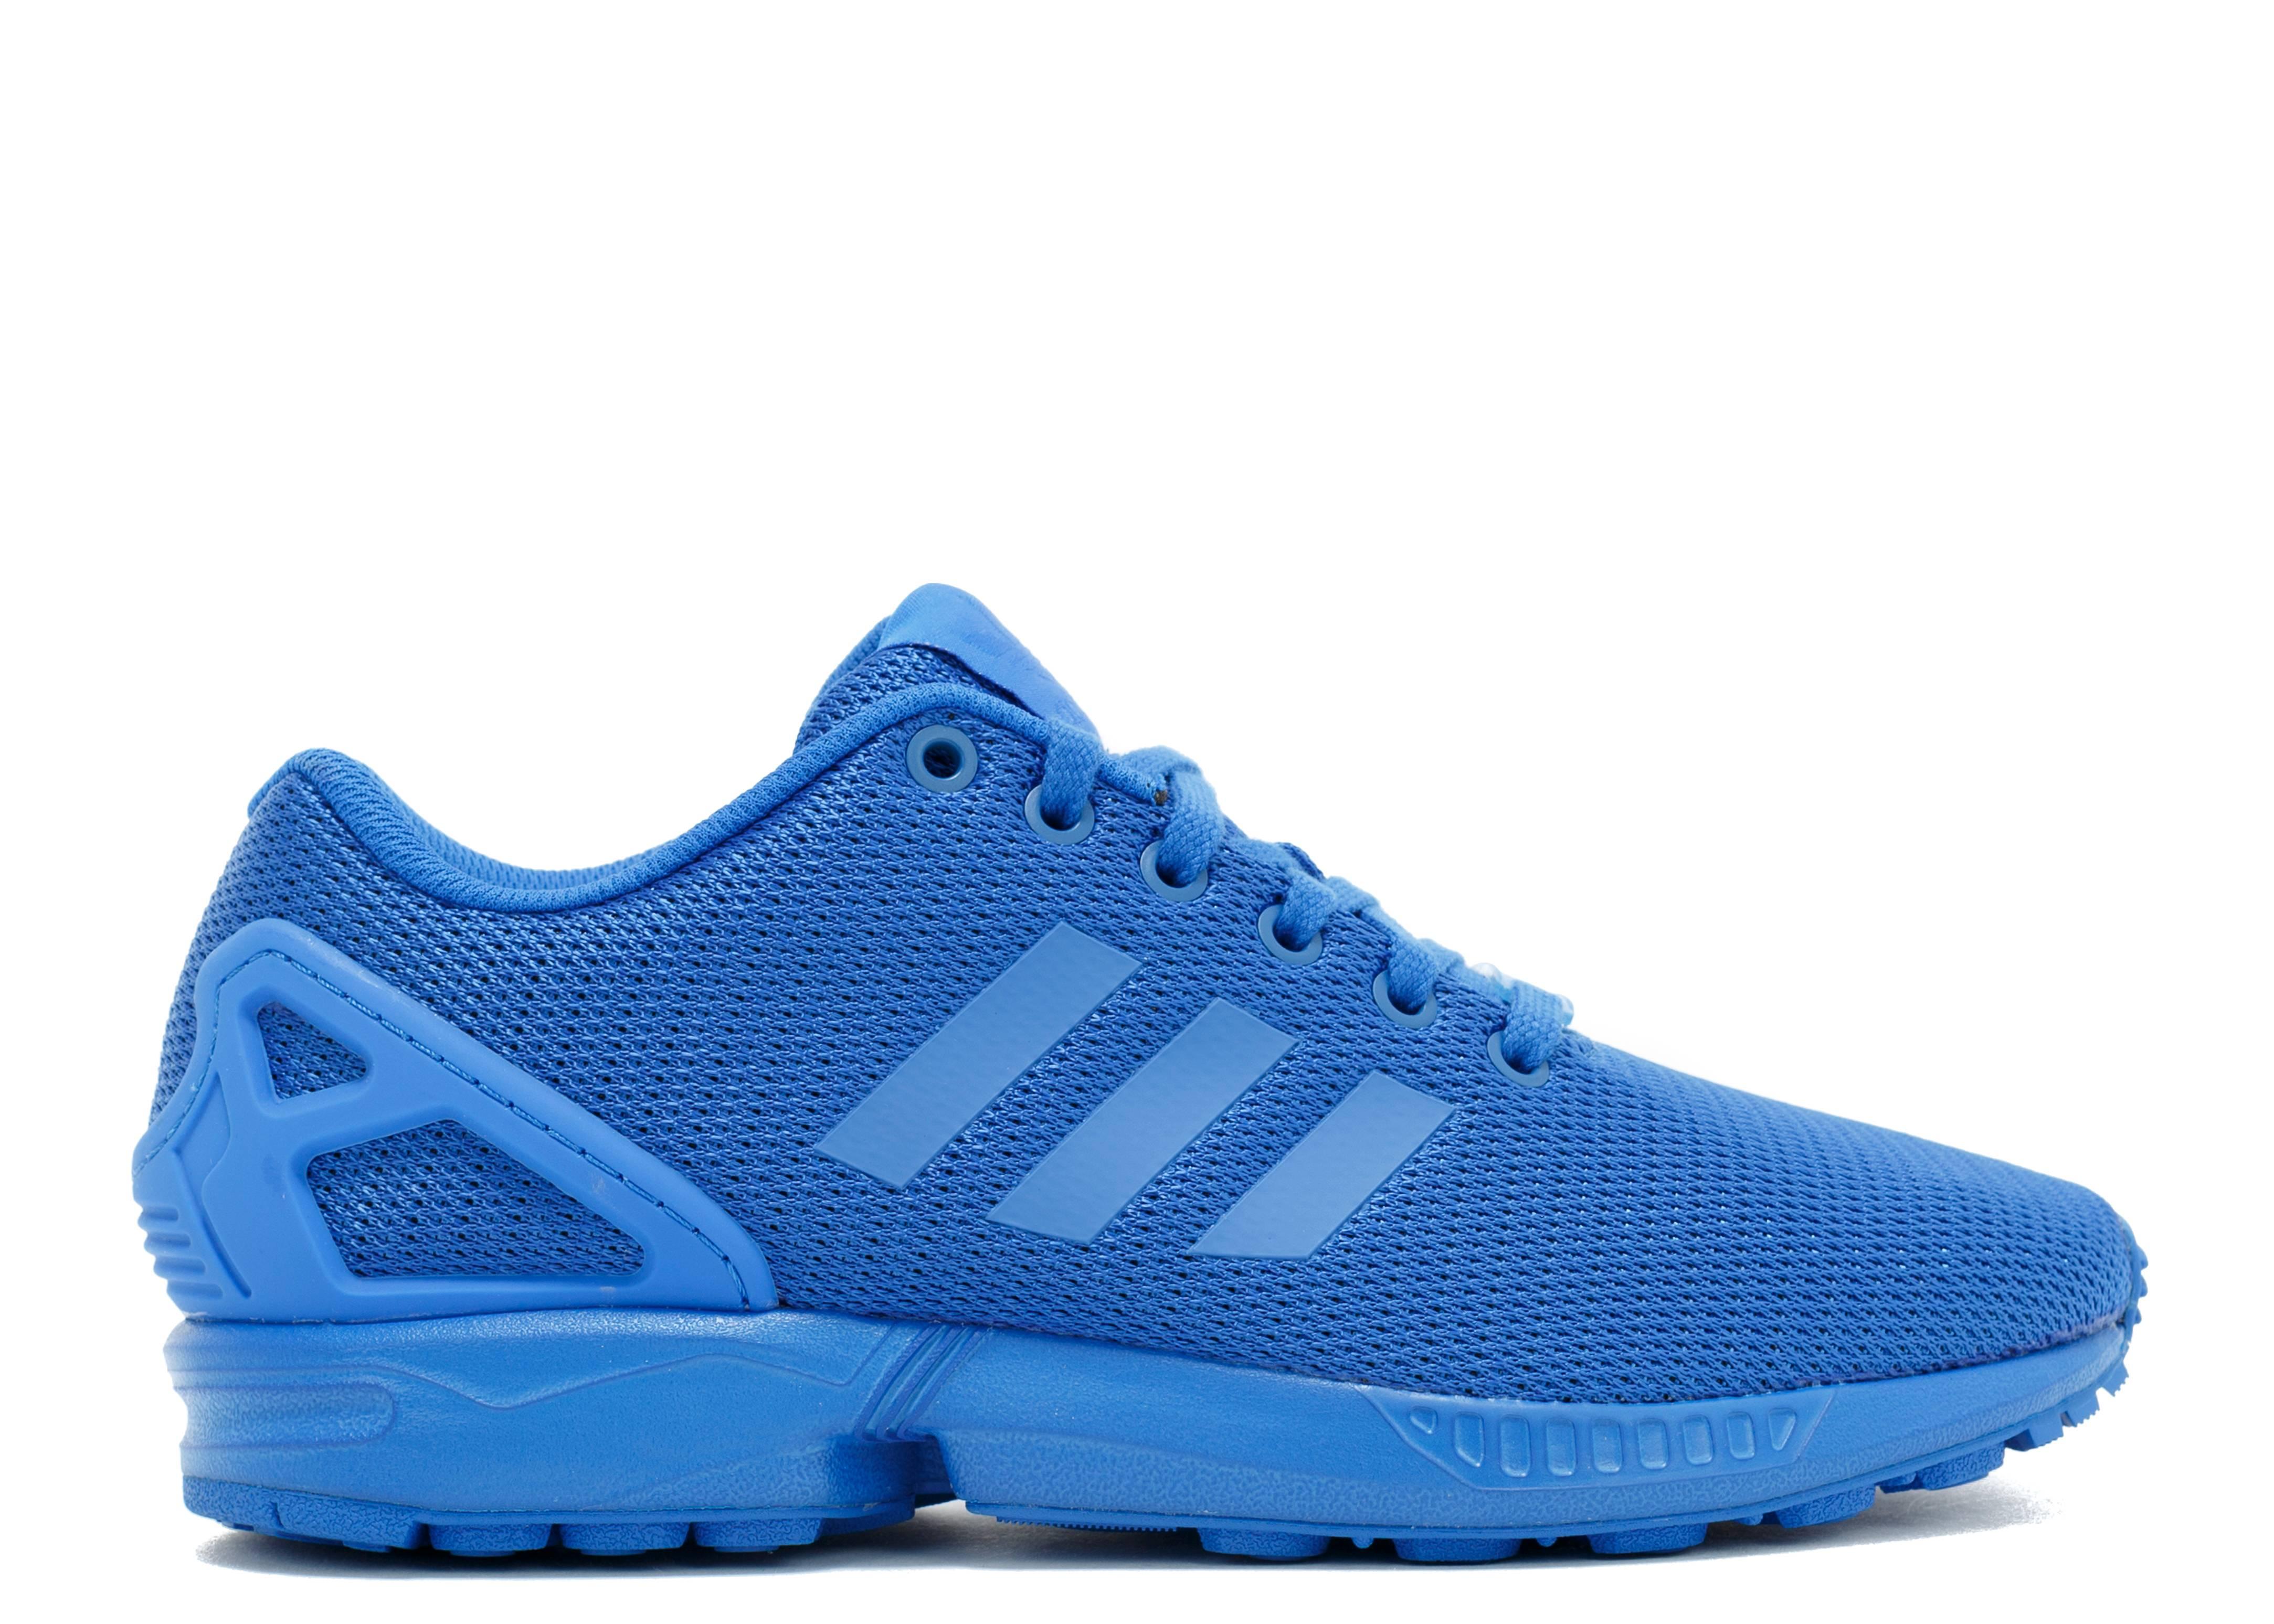 online store 8ad97 aacd7 Zx Flux - Adidas - s32280 - blue/blue/boblue | Flight Club